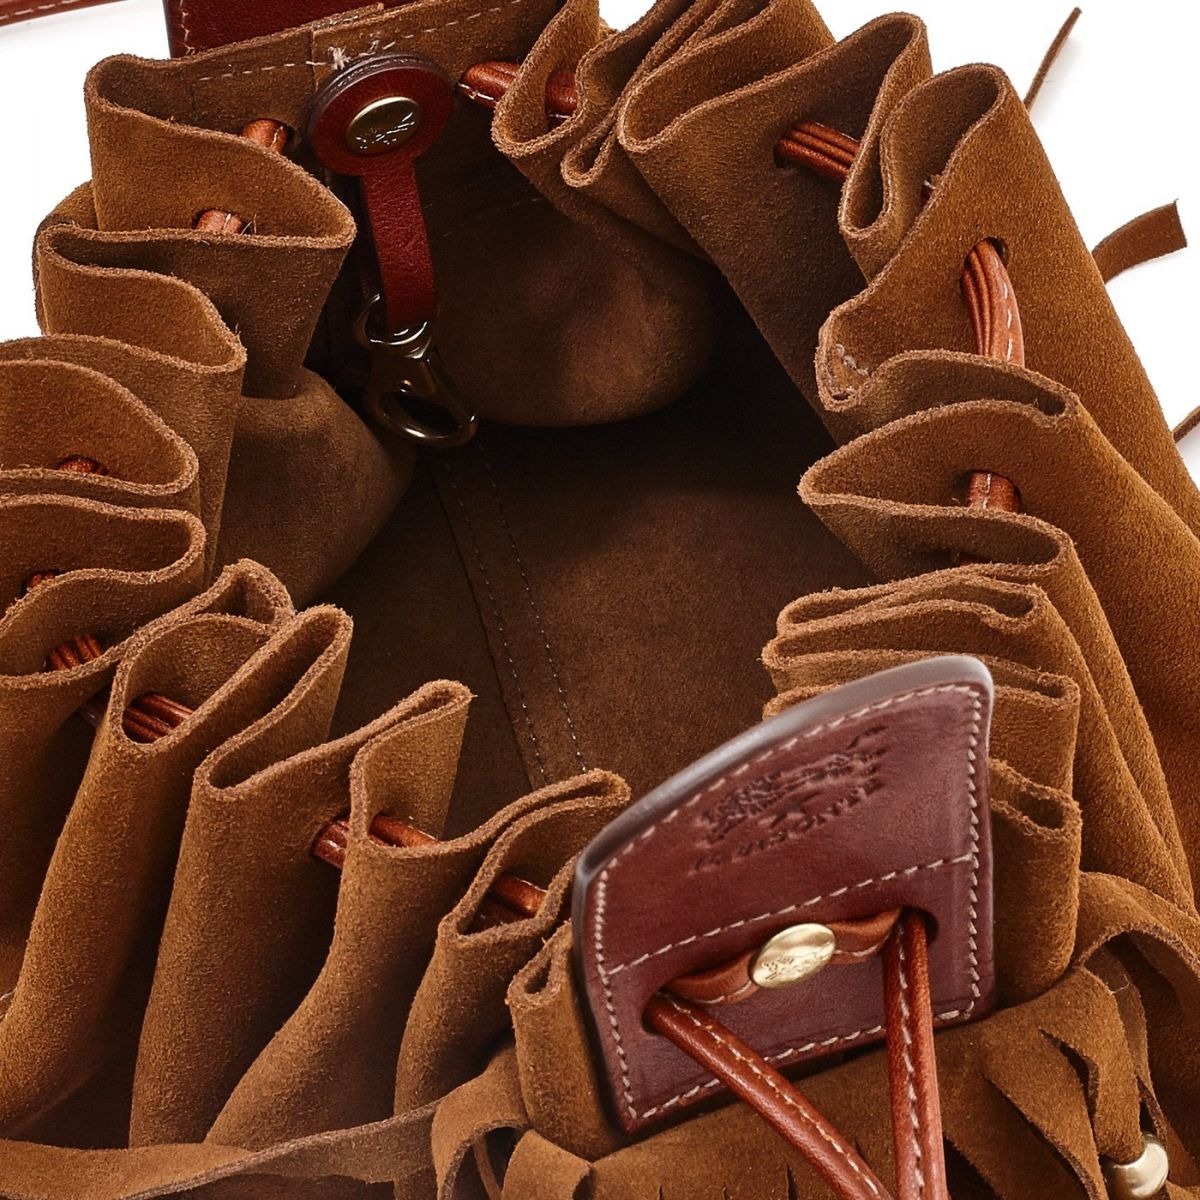 Women's Crossbody Bag Talamone in Suede BCR113 color Hazelnut | Details